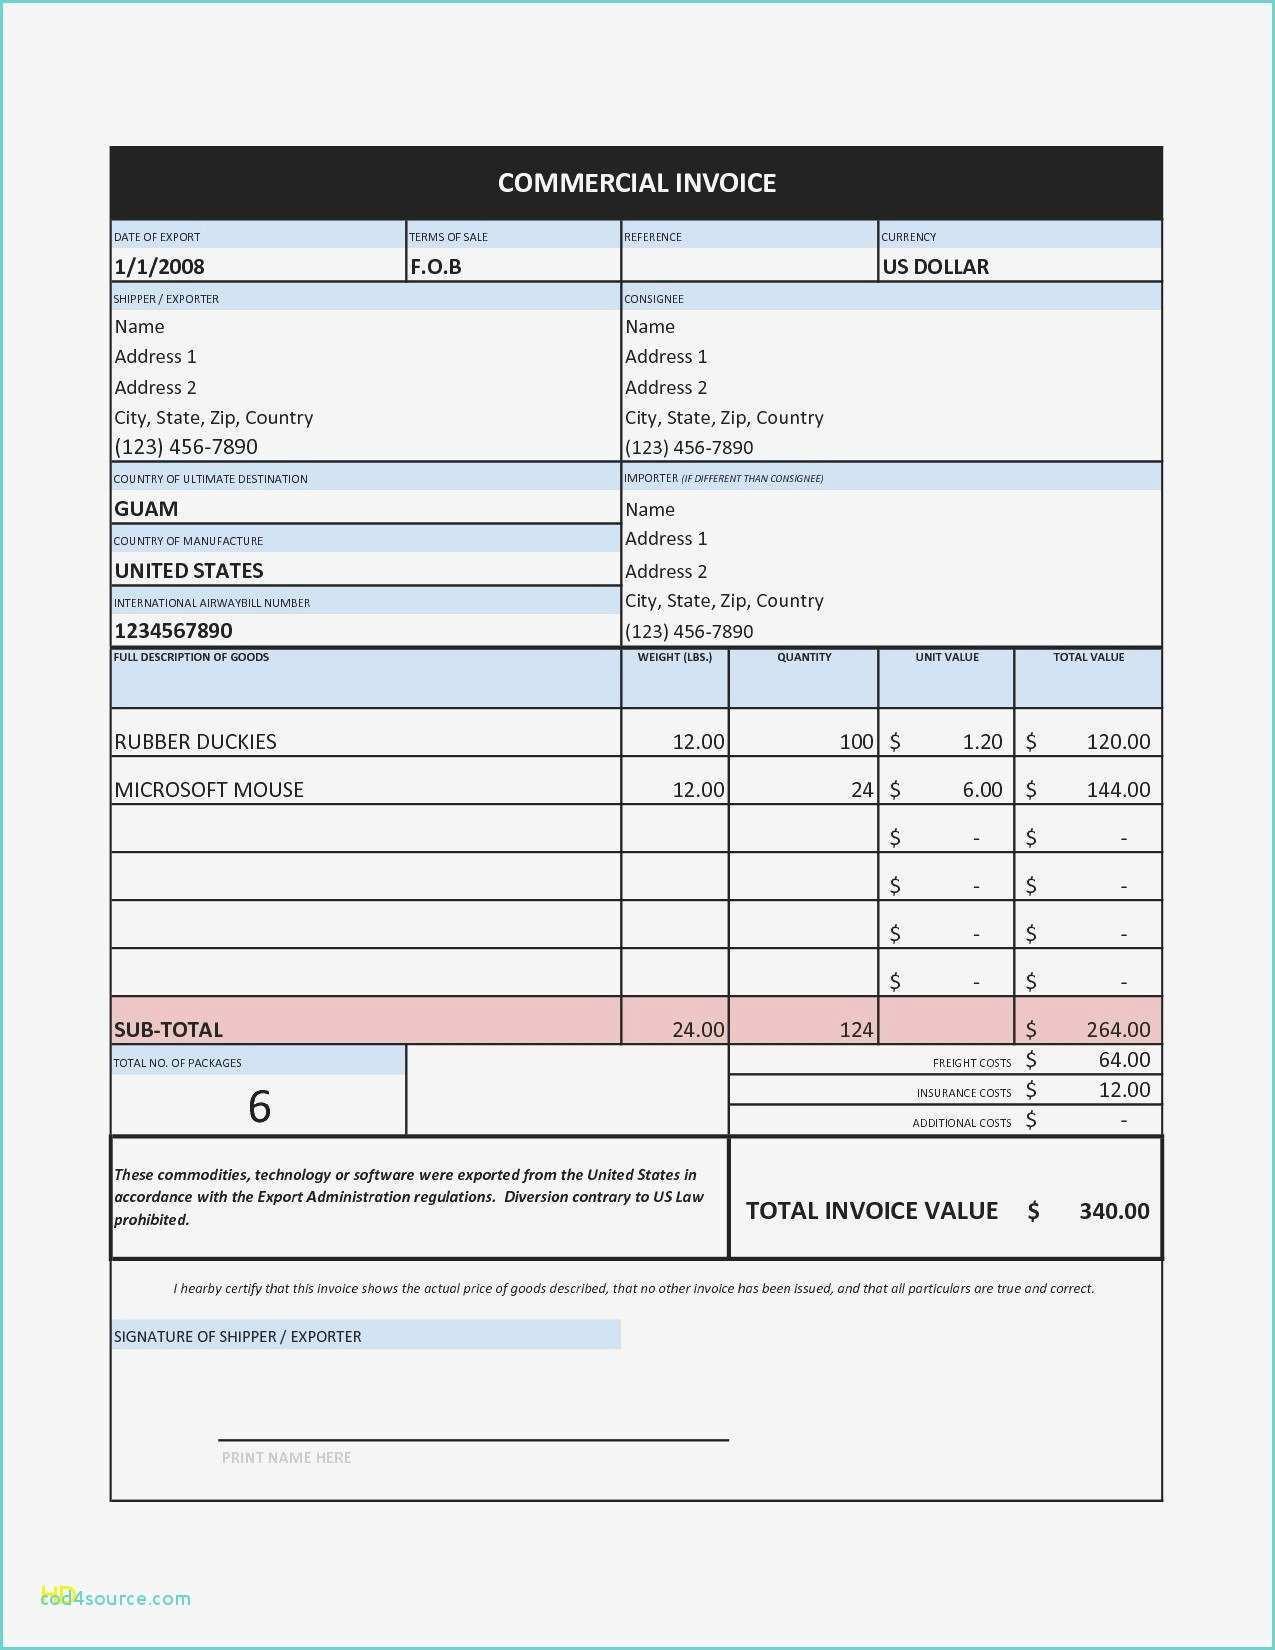 Free Invoice Templates Printable Of Free Printable Checks Template - Free Printable Checks Template